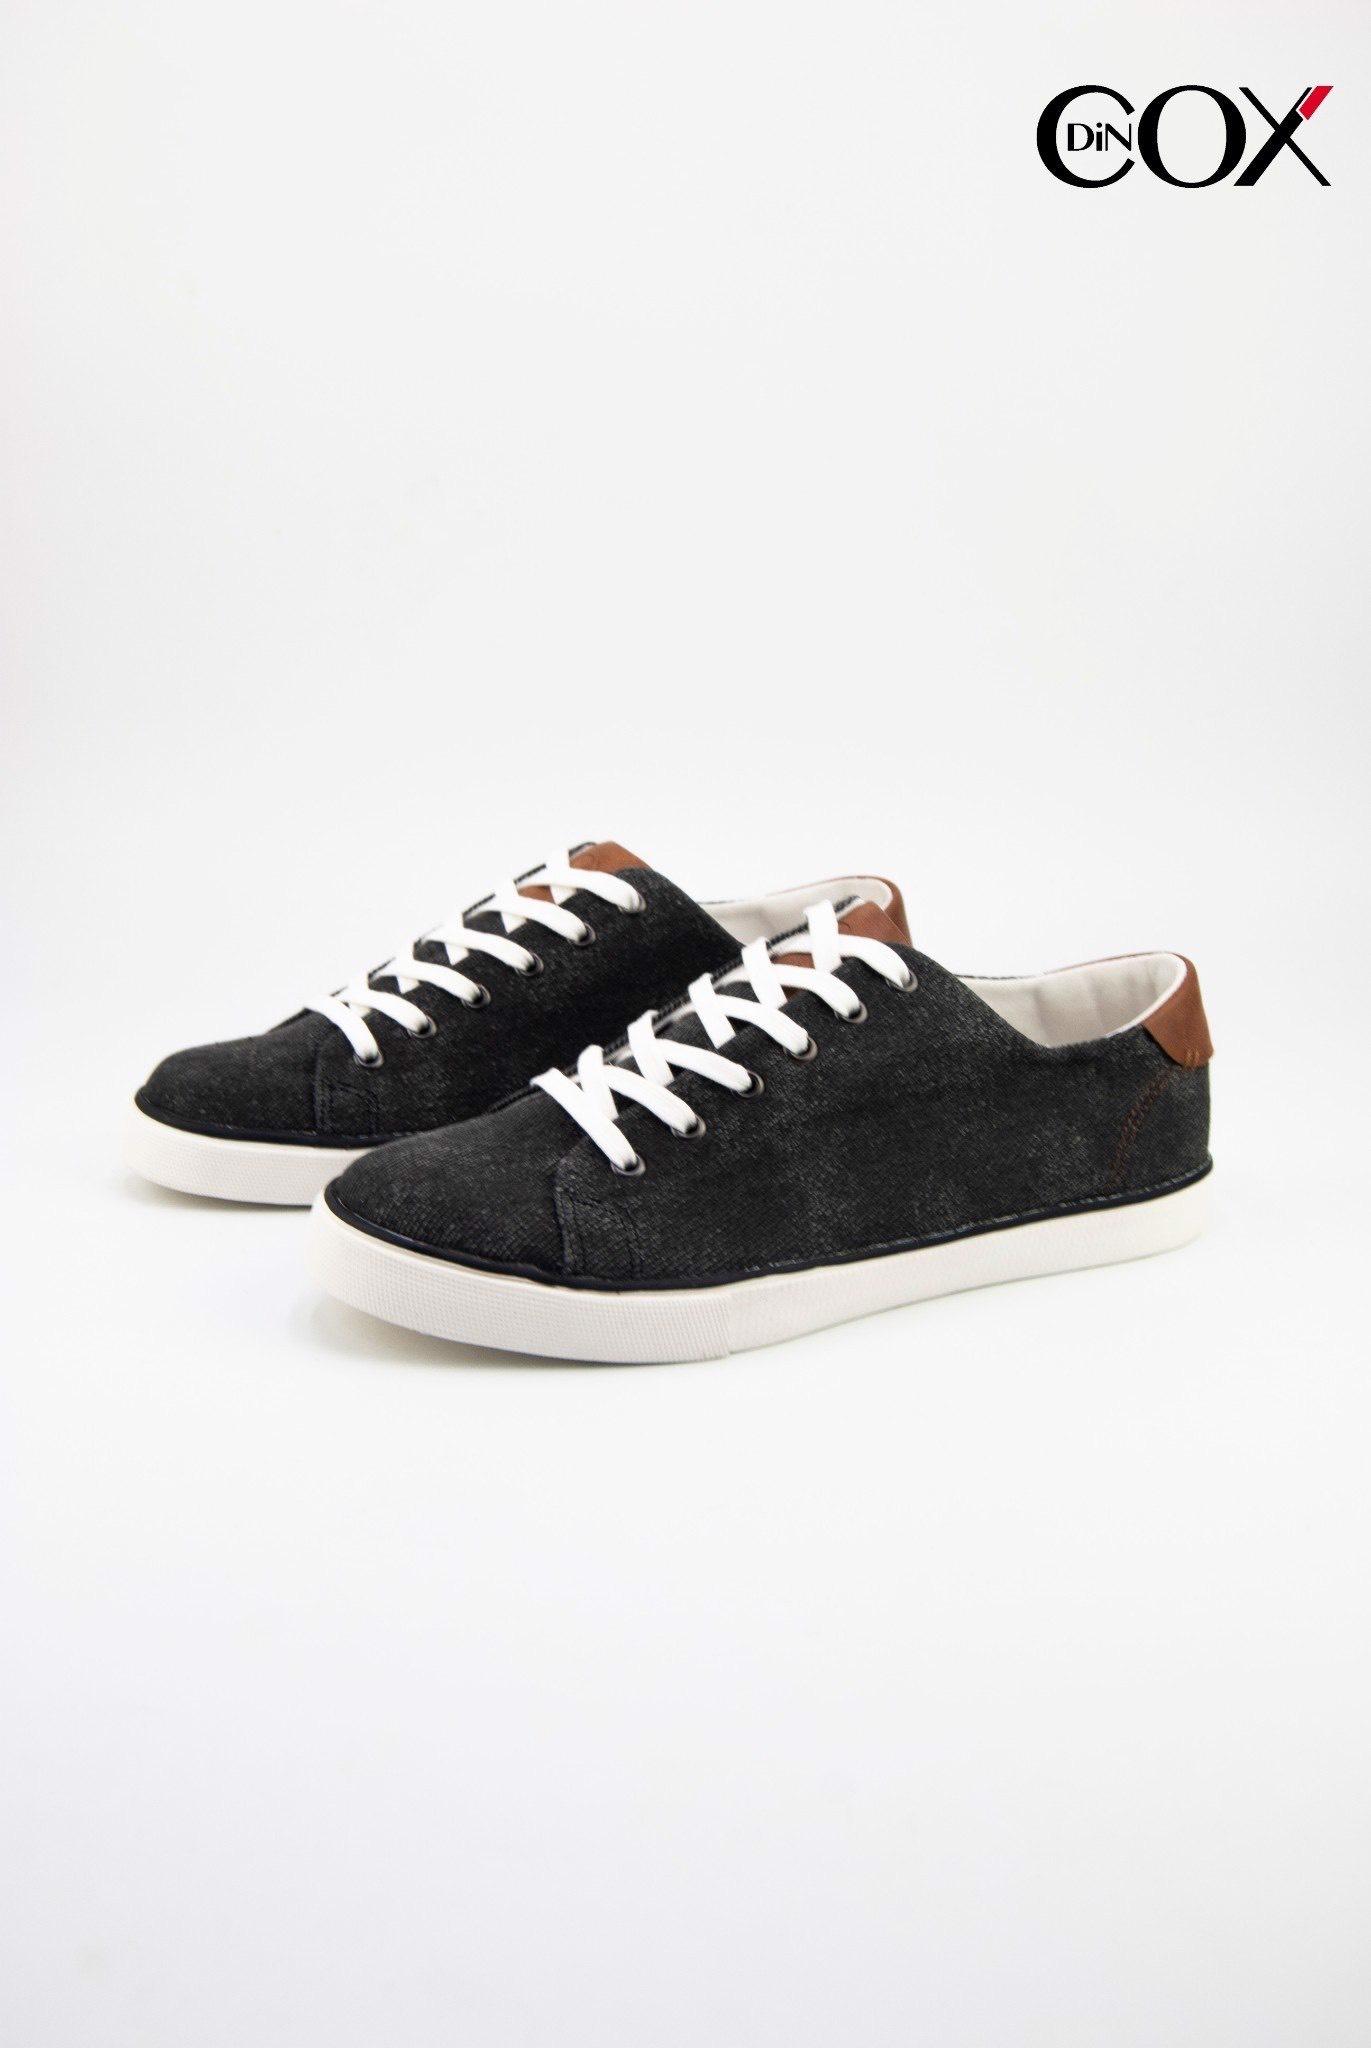 dincox4083-black